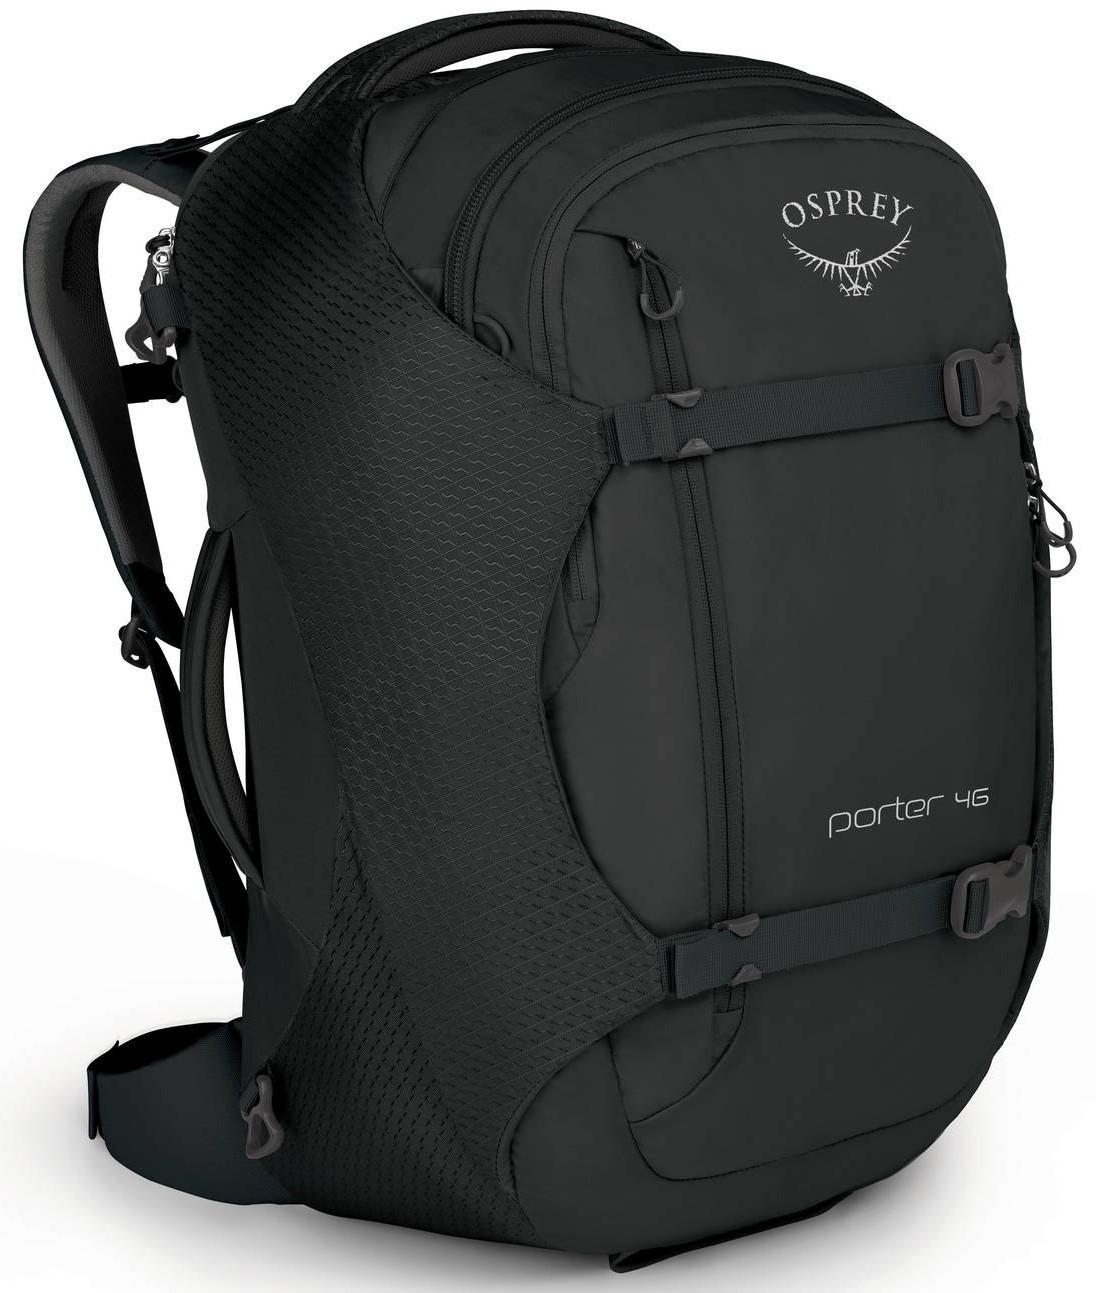 Сумки-рюкзаки Сумка-рюкзак Osprey Porter 46 Black Porter_46_F17_Side_Black_web.jpg